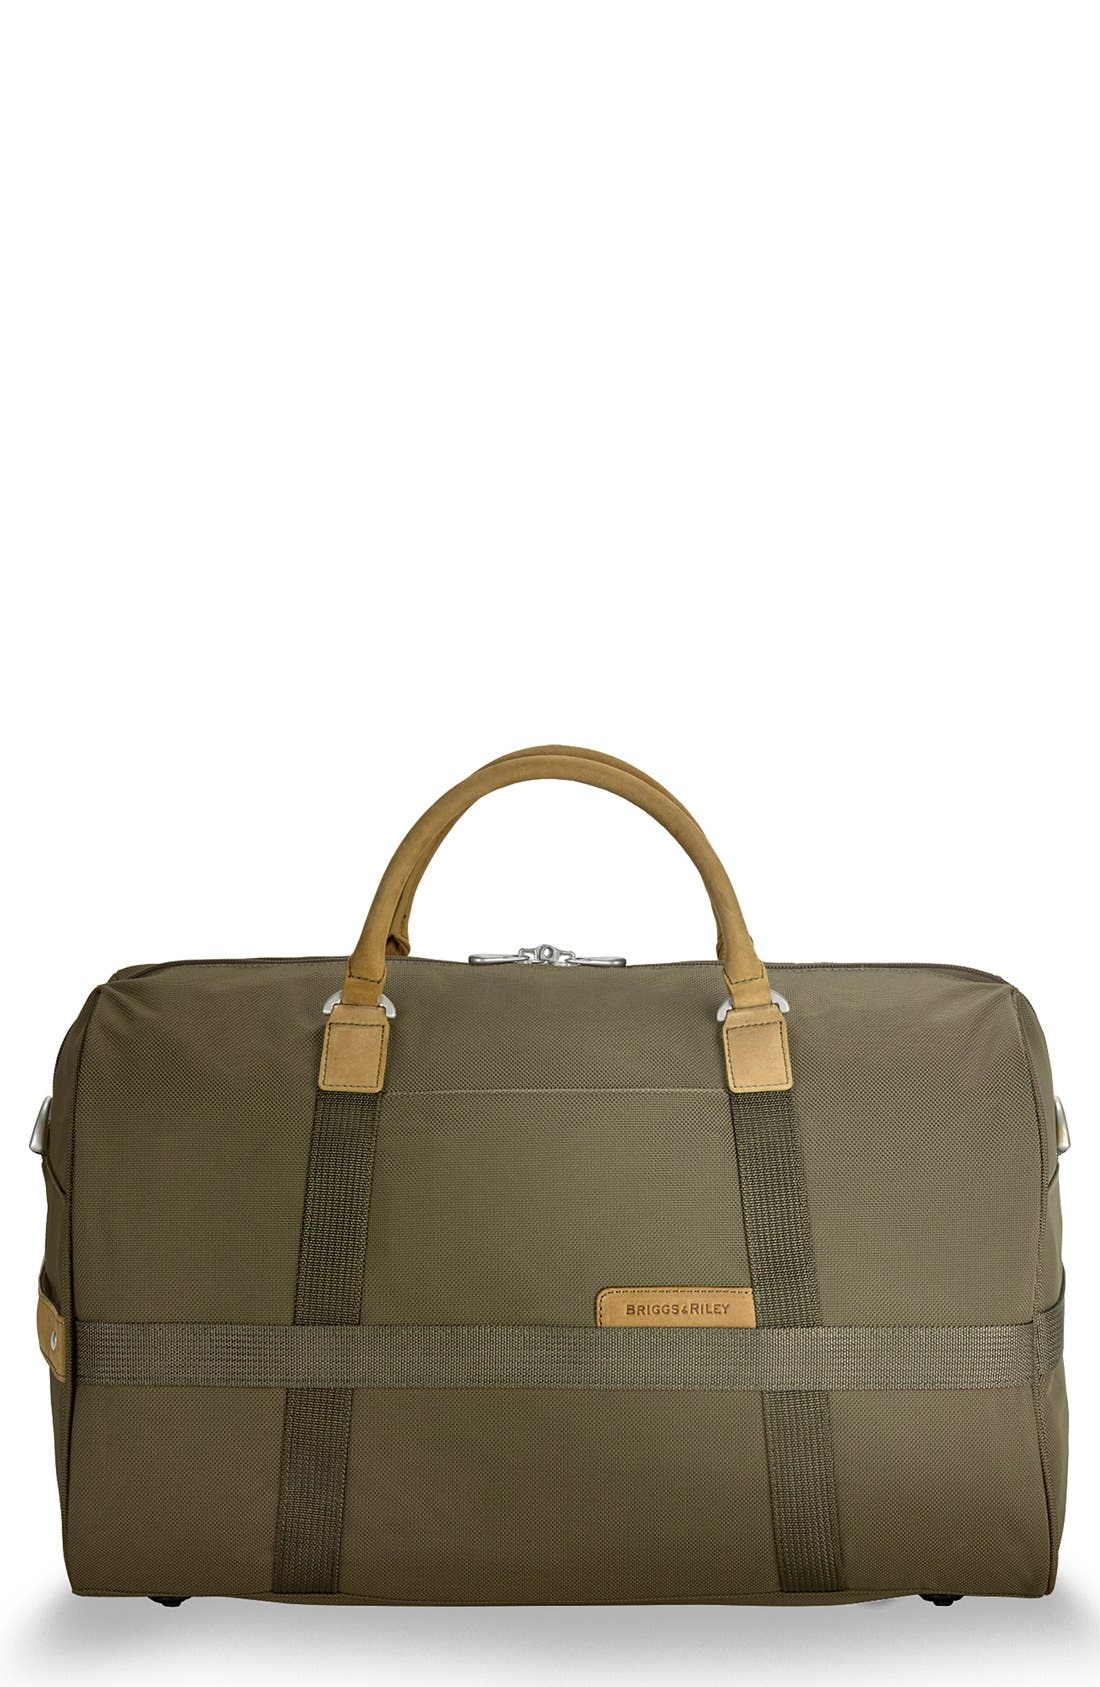 'Baseline - Medium' Duffel Bag,                         Main,                         color, 310